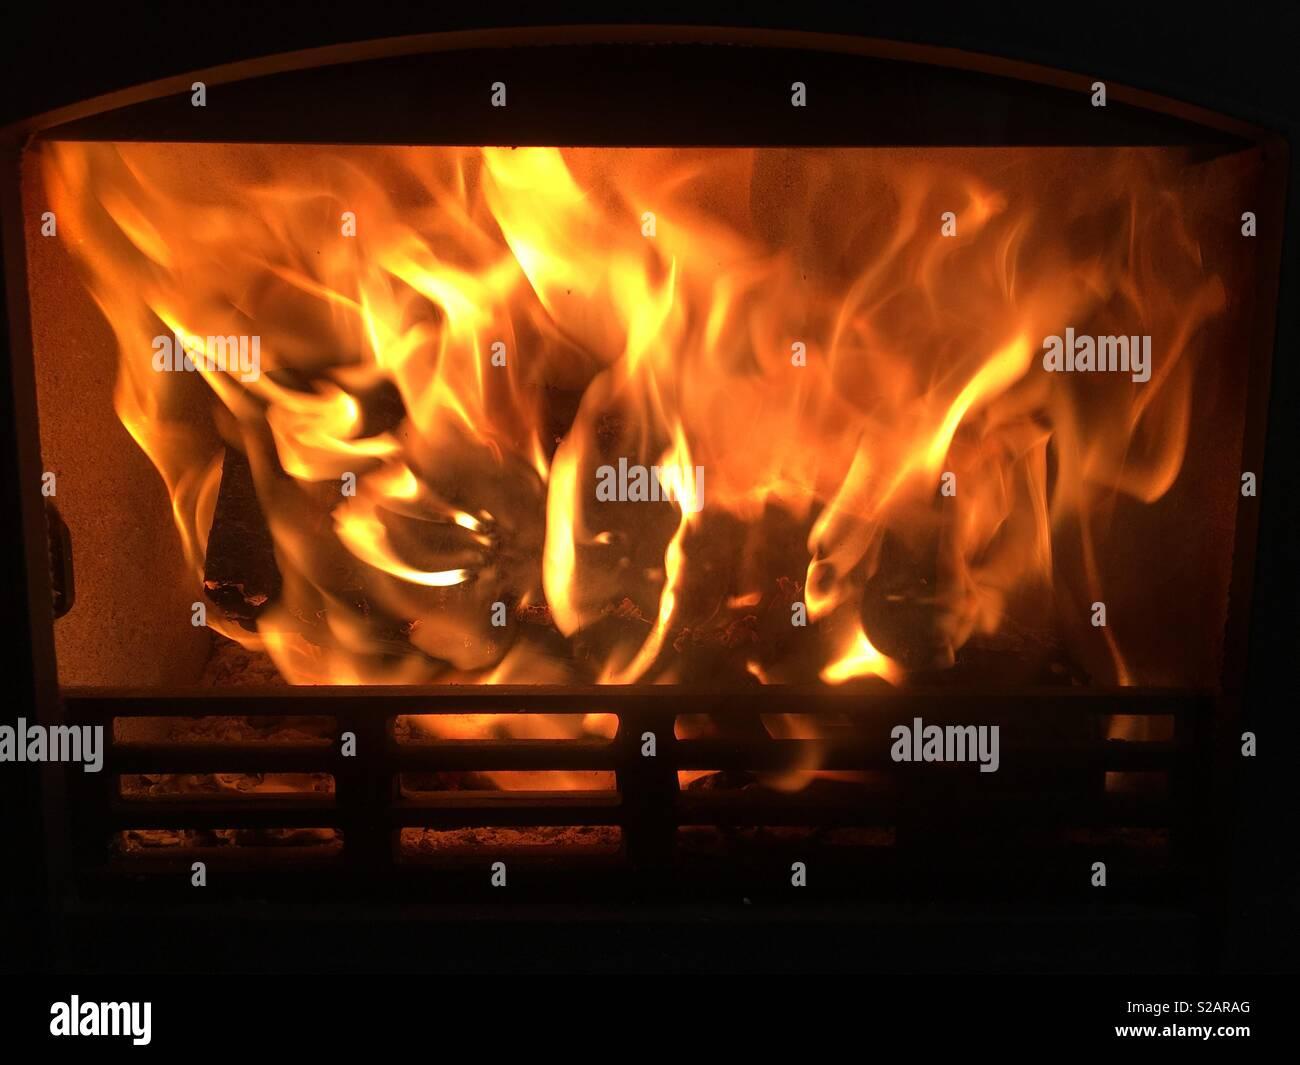 Fire burning fiercely in log burner close up - Stock Image